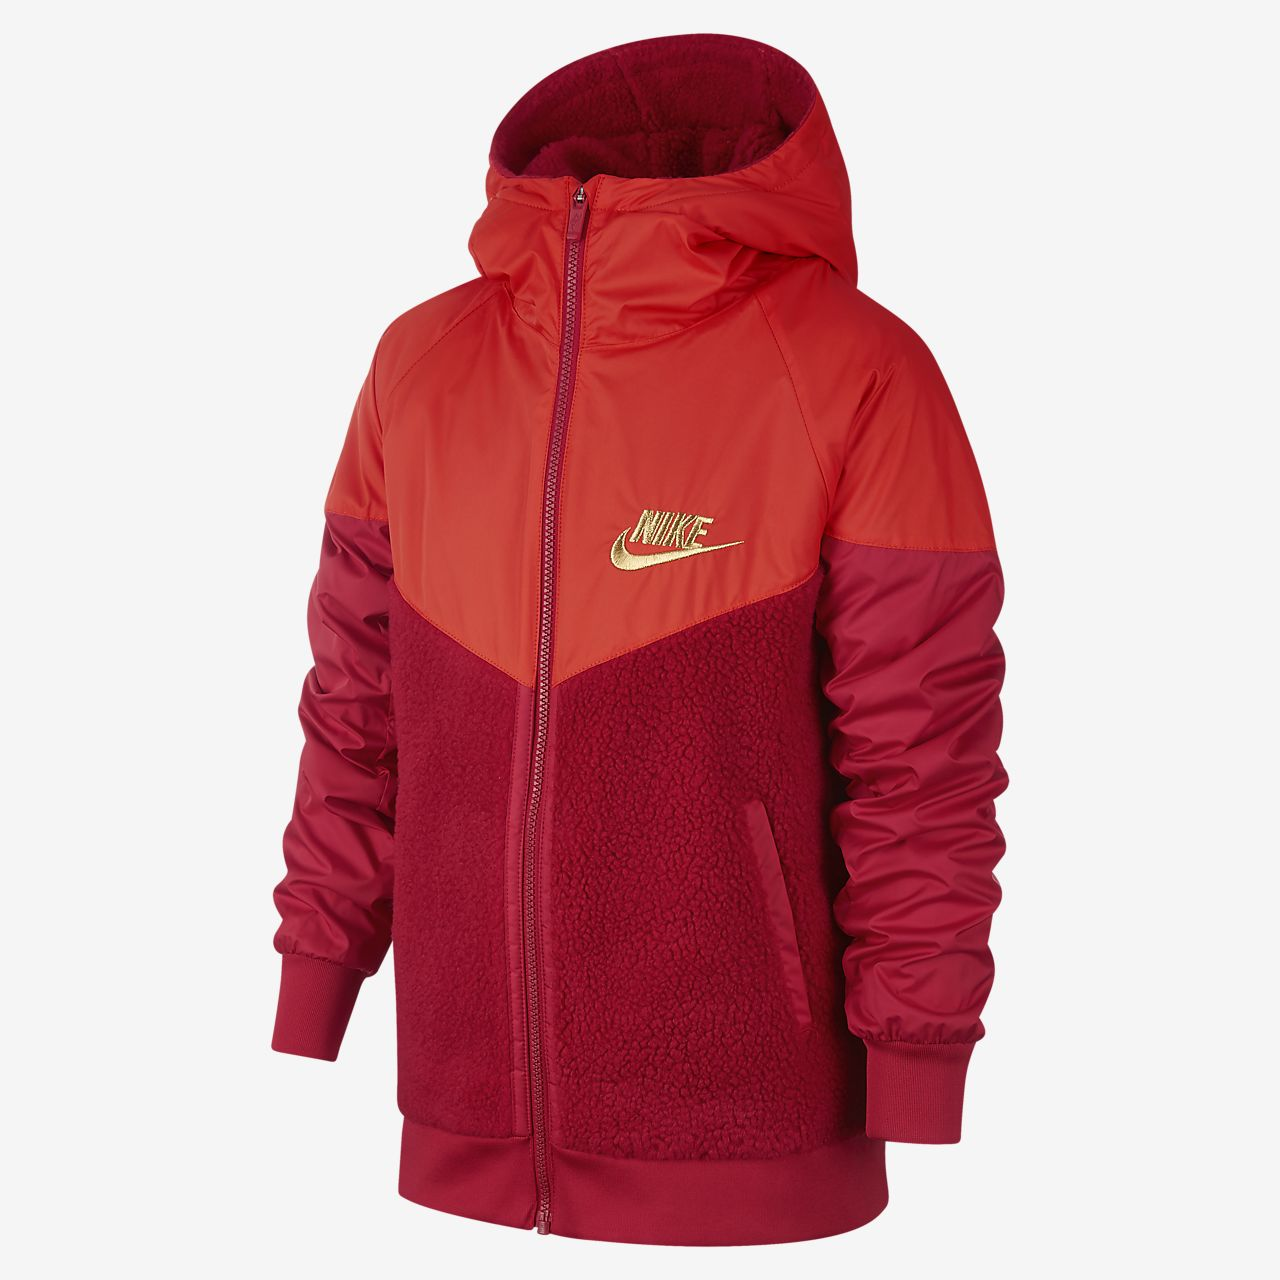 Nike Sportswear WindrunnerSherpa 大童(男孩)夹克